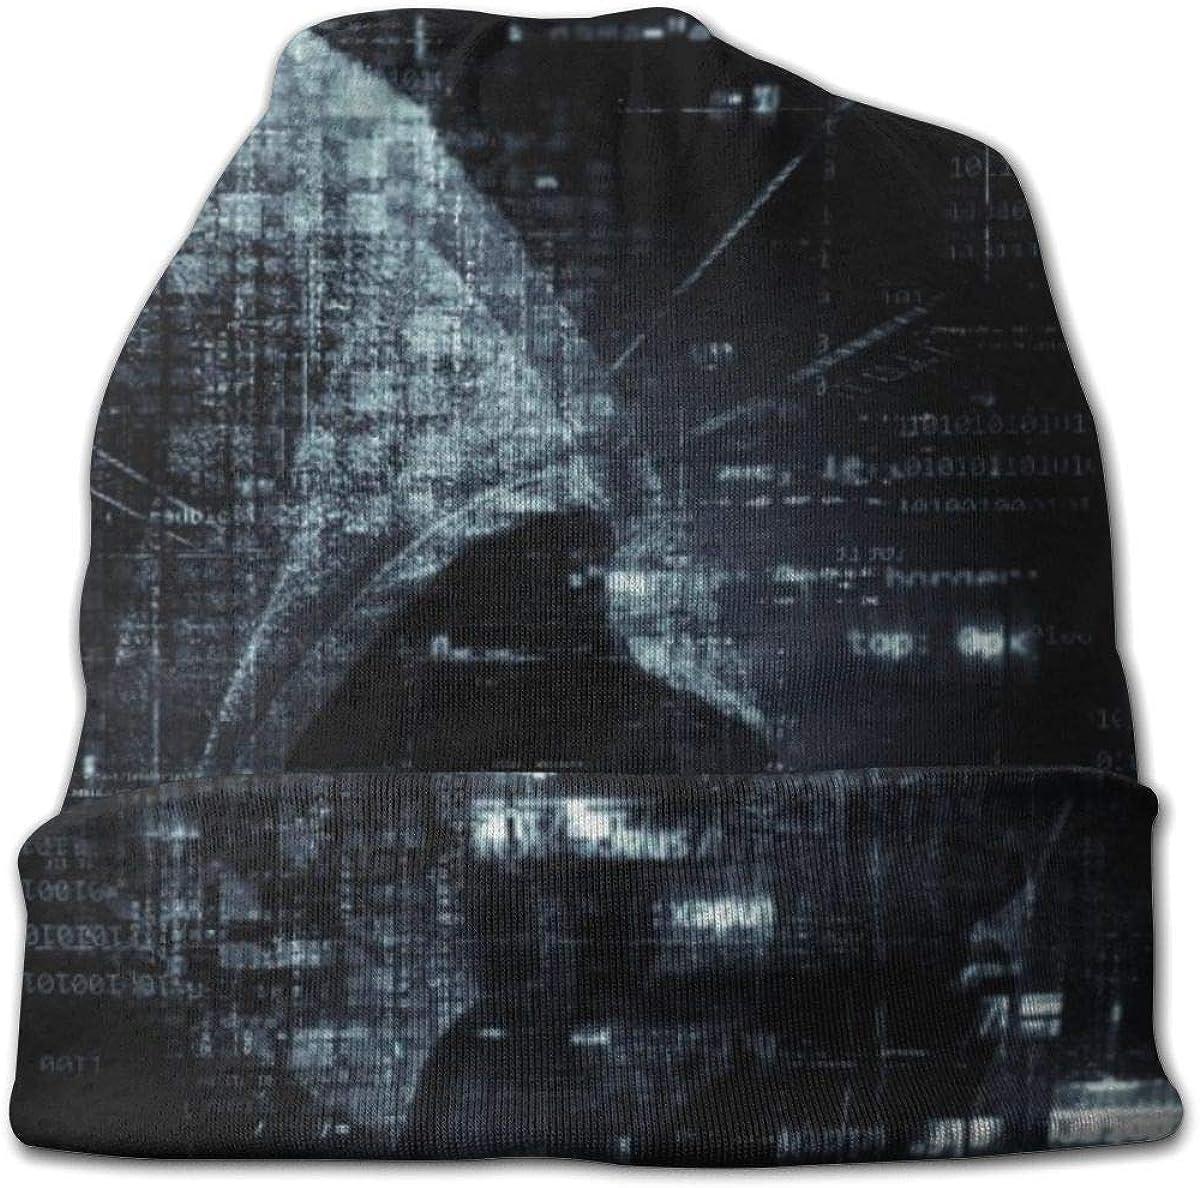 Hacker Attack Password Beanie Hat for Men and Women - Warm Unisex Cuffed Plain Skull Knit Hat Cap